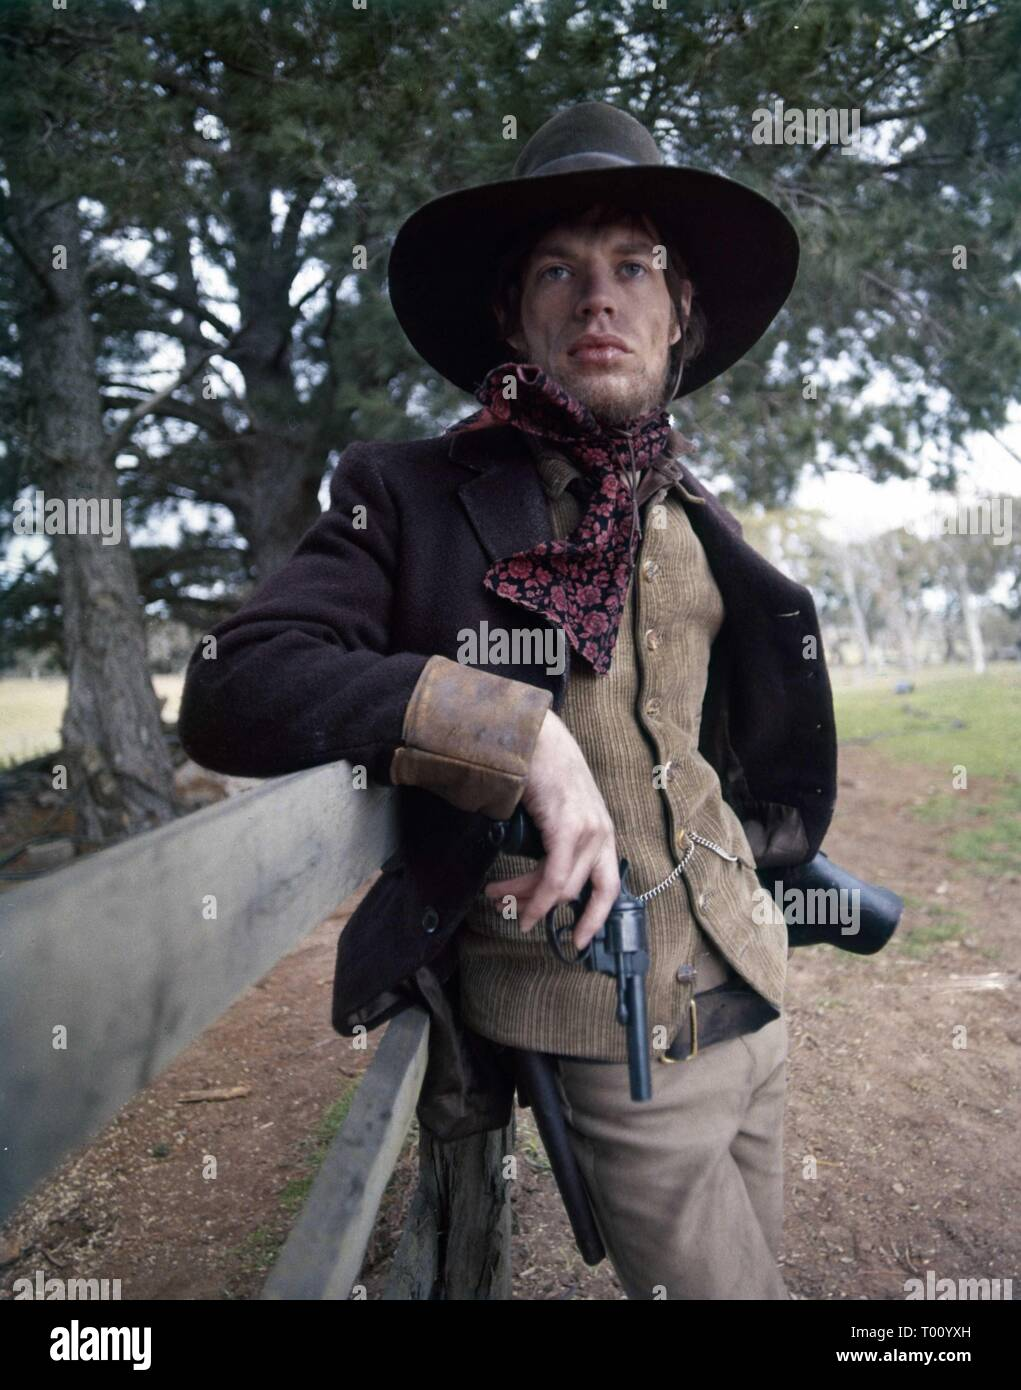 MICK JAGGER NED KELLY 1970 19th Century Australian Outlaw director Tony Richardson Woodfall Film Productions / United Artists - Stock Image